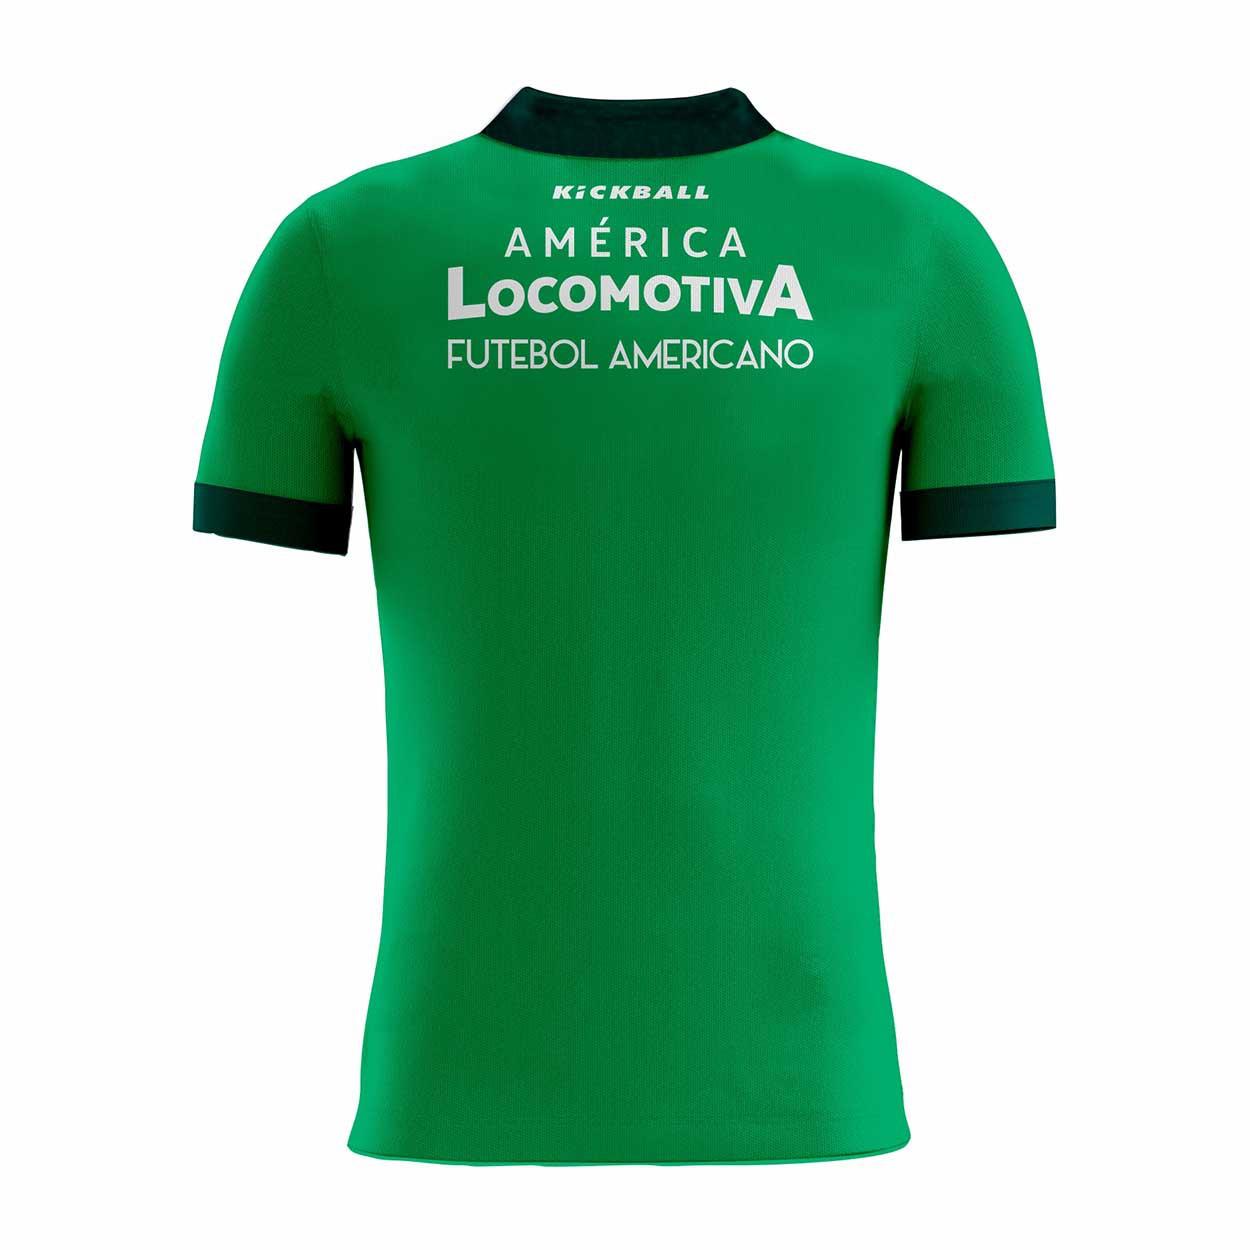 Camisa Of. América Locomotiva Tryout Polo Fem. Mod1